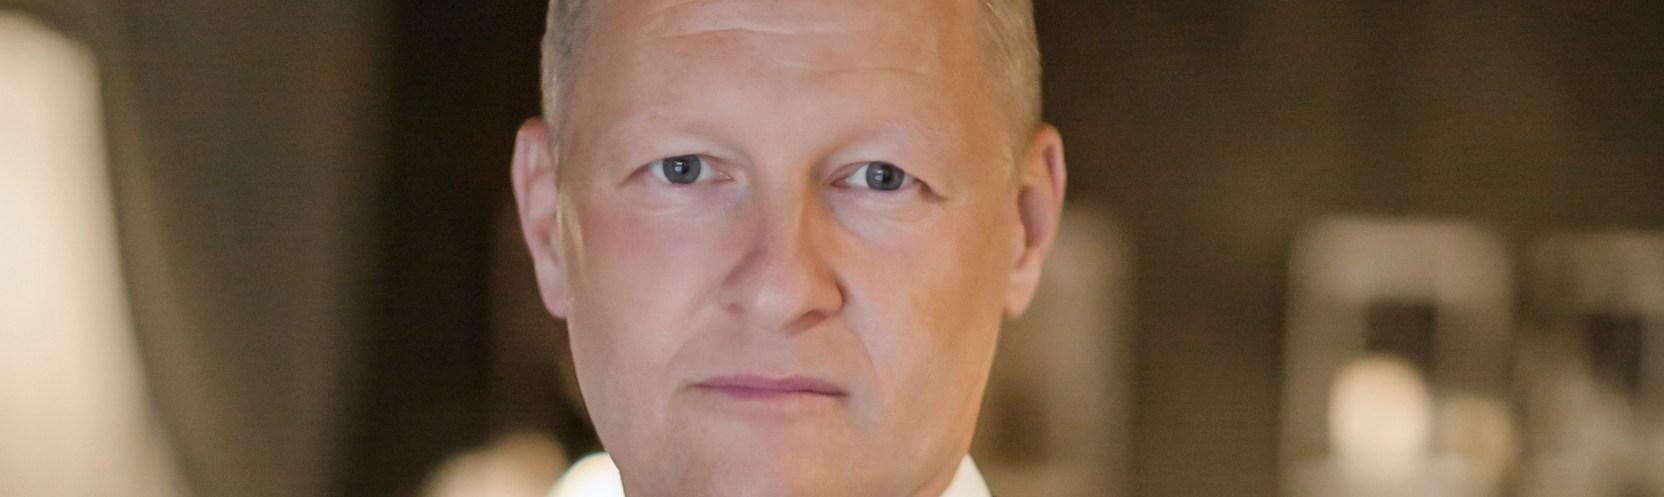 Ulf Gustavssons 'Quality Profile' in 'Kvalitetsmagasinet'.